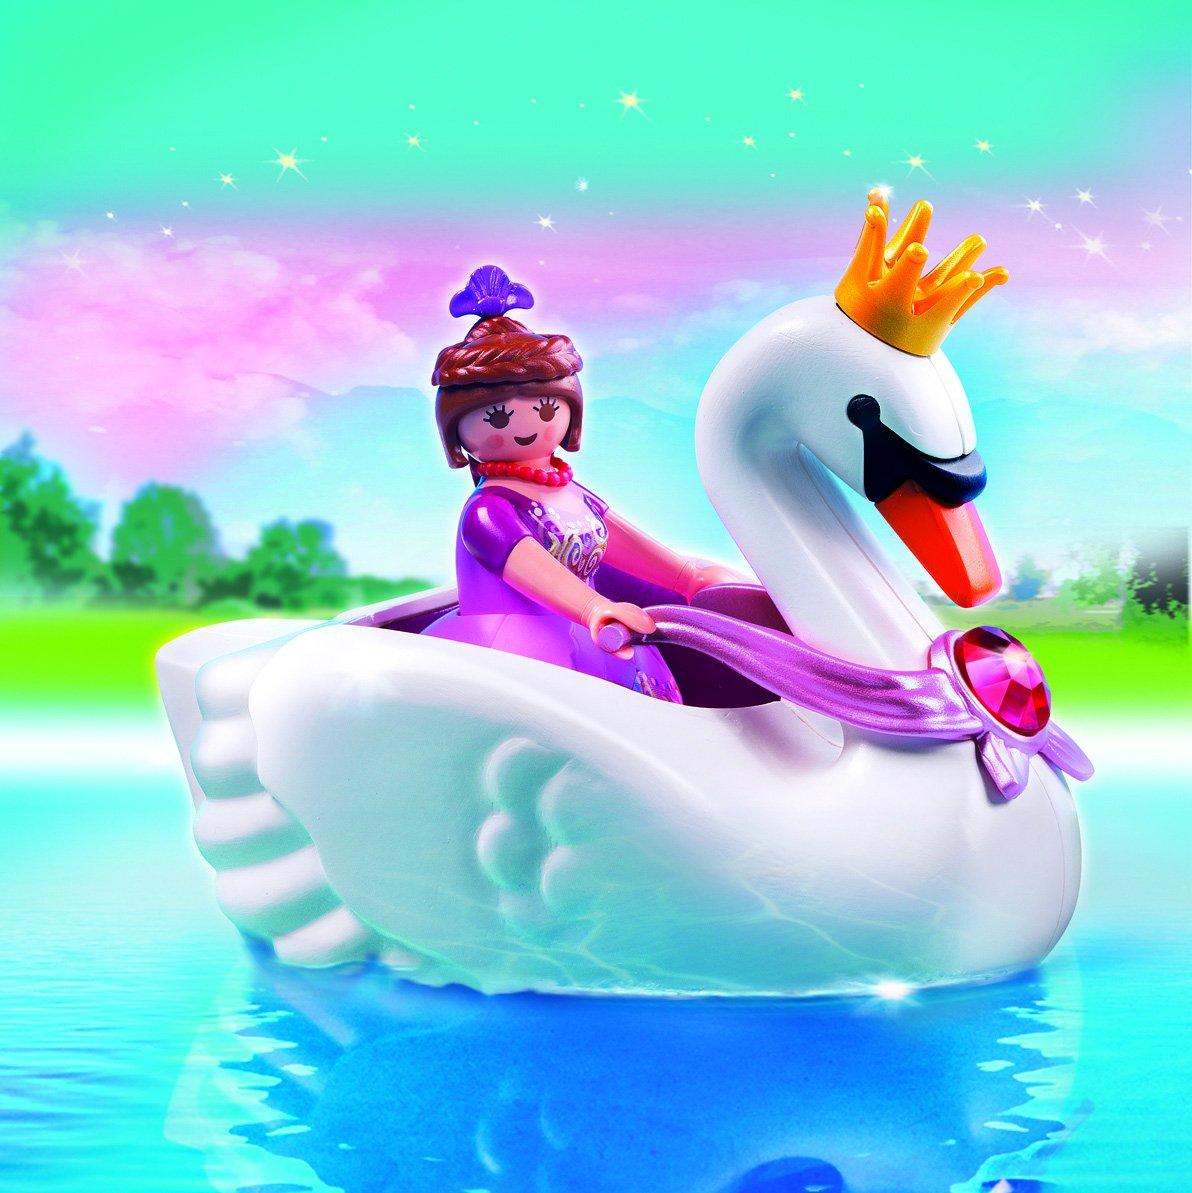 Amazon.com: PLAYMOBIL Princess with Swan Boat Playset: Toys & Games